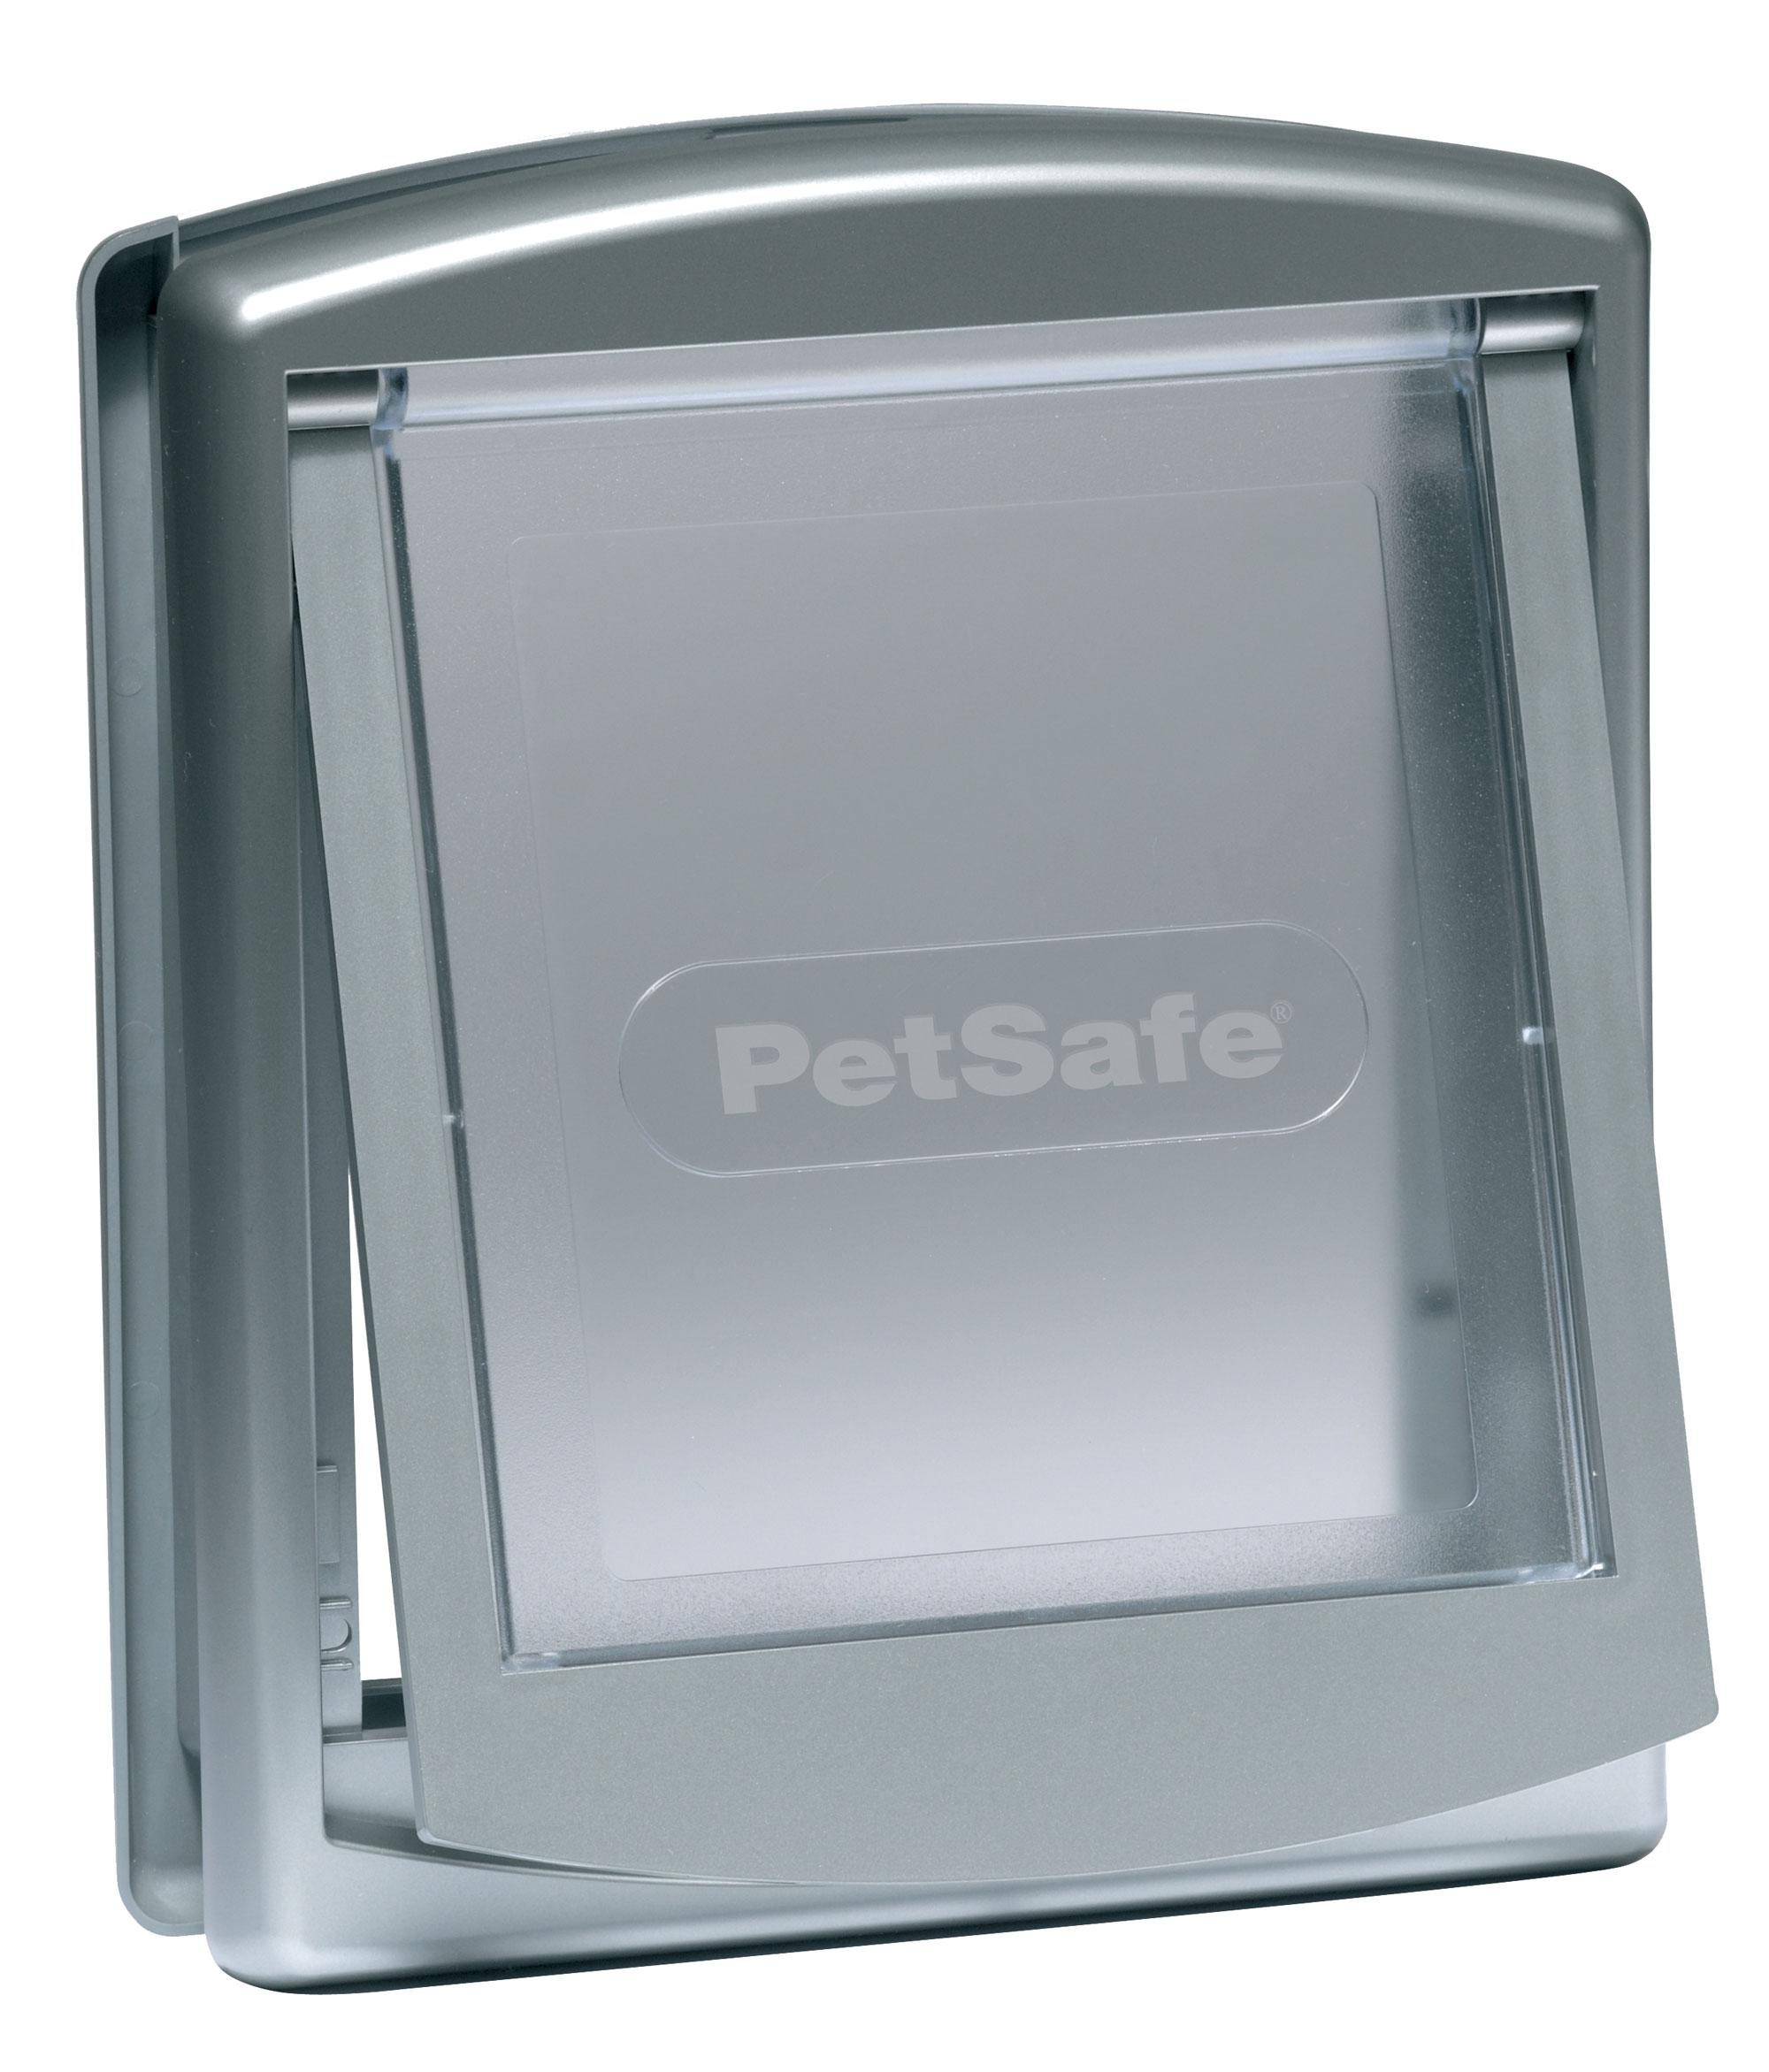 Hundetür / Hundeklappe PetSafe Staywell Original klein 236x198mm grau Bild 1